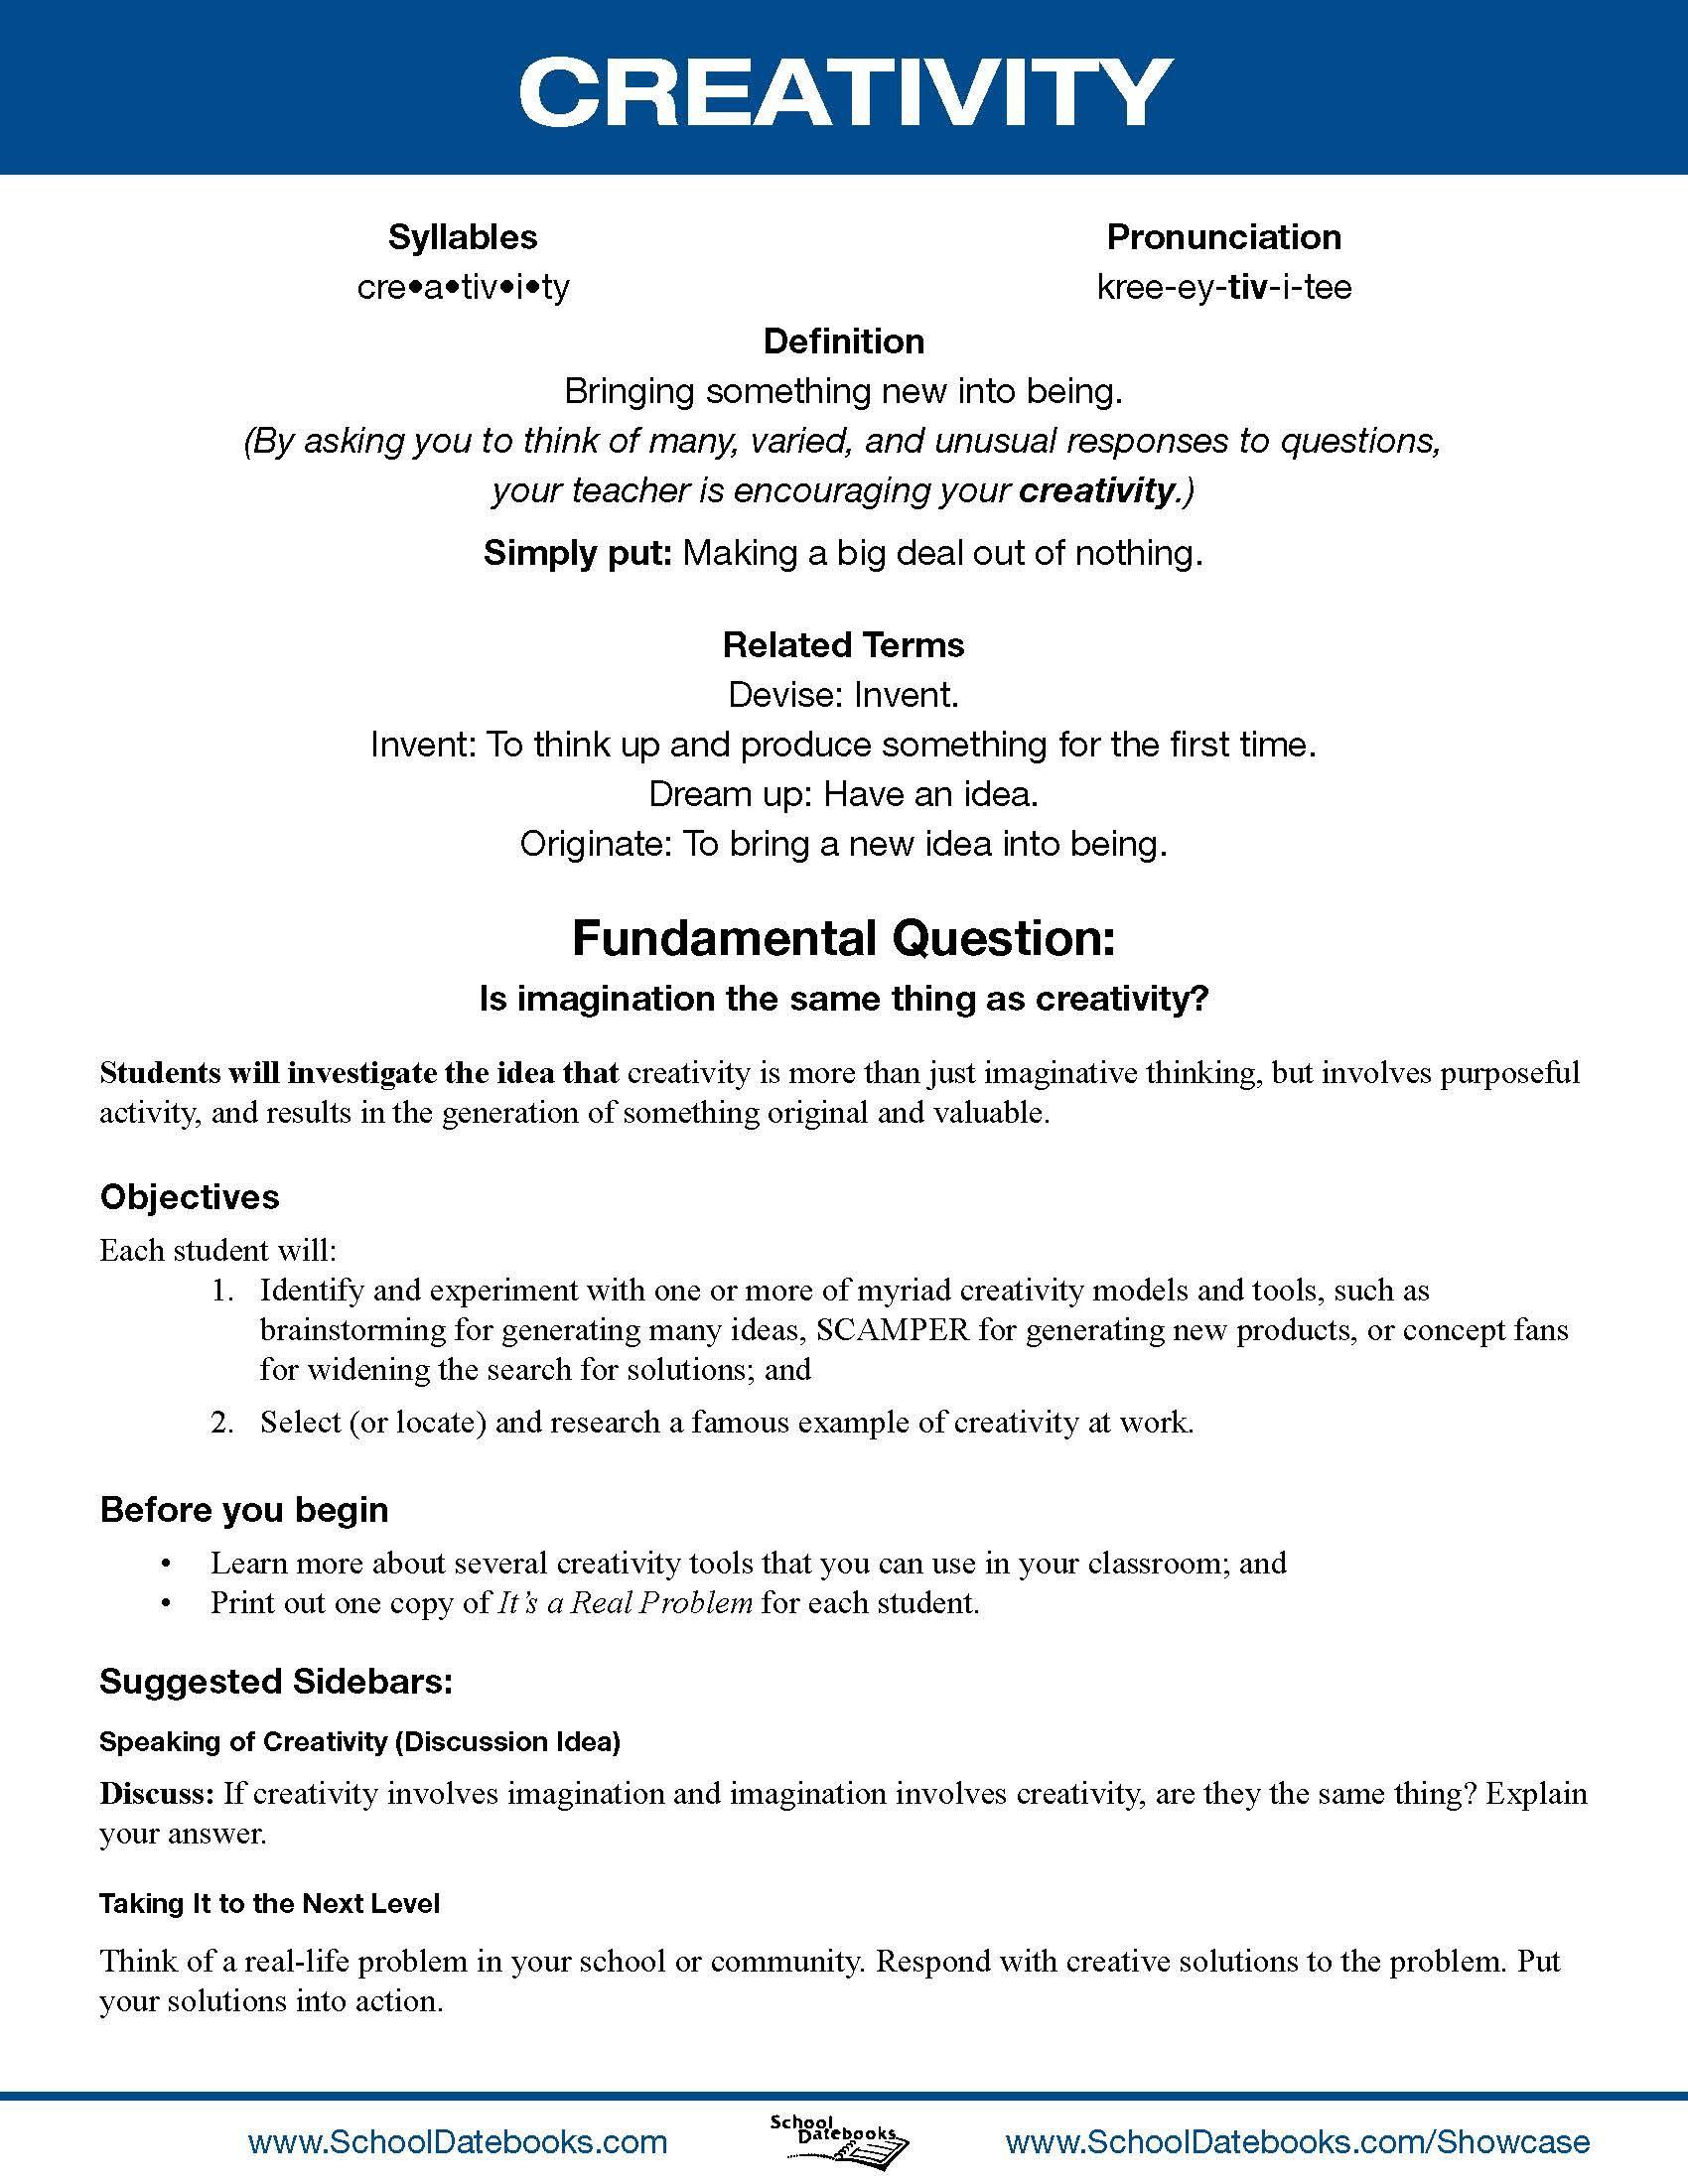 School Datebooks Character Education Lesson Plans Creativity